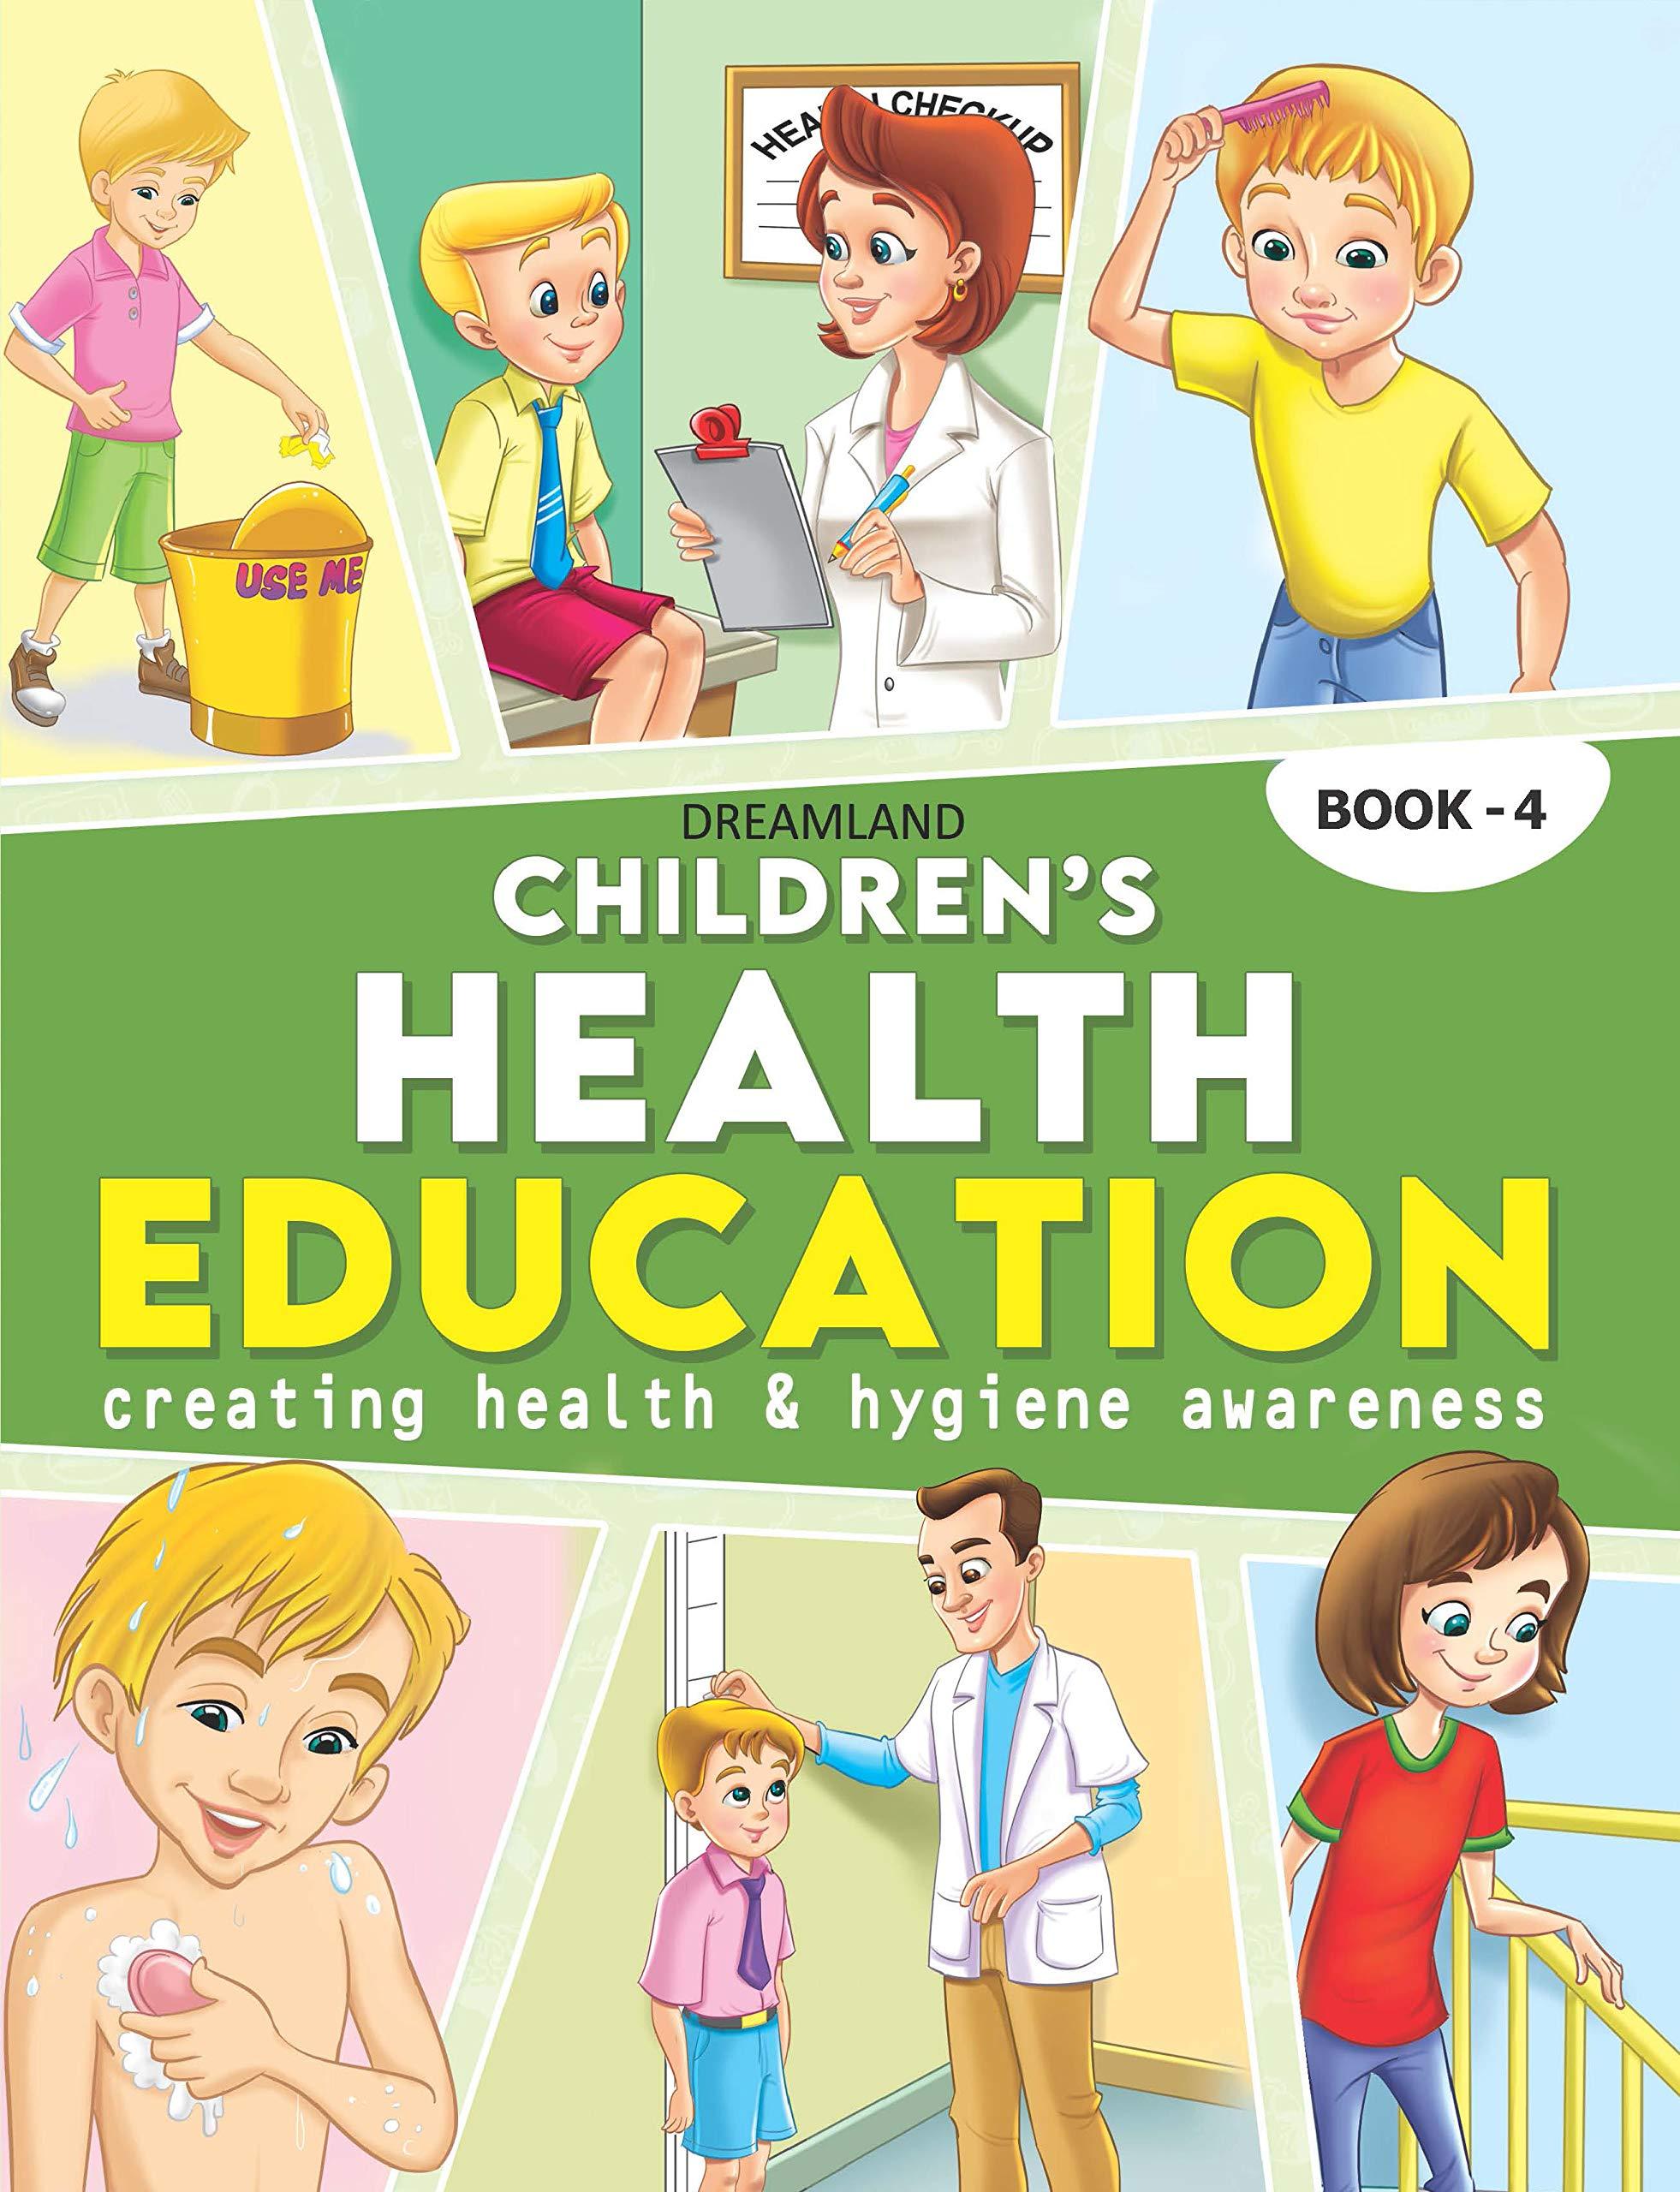 Children's Health Education - Book 4